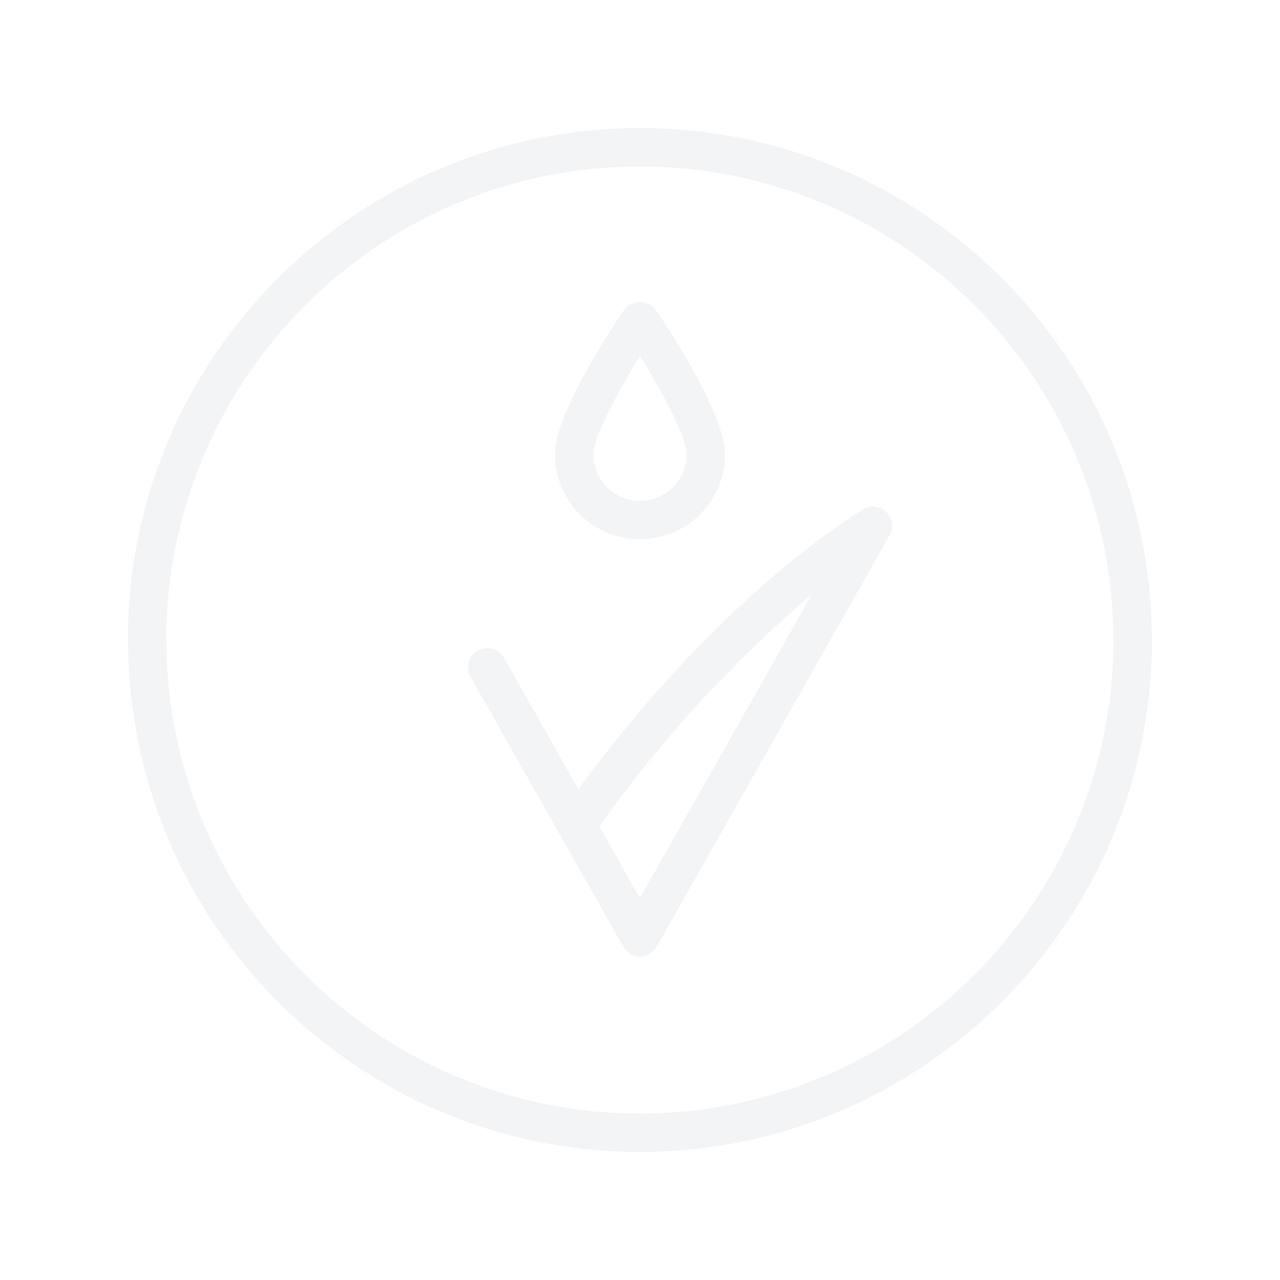 Sleek Makeup Twist Up Lip Pencil No.652 Deep Cherry 0.3g